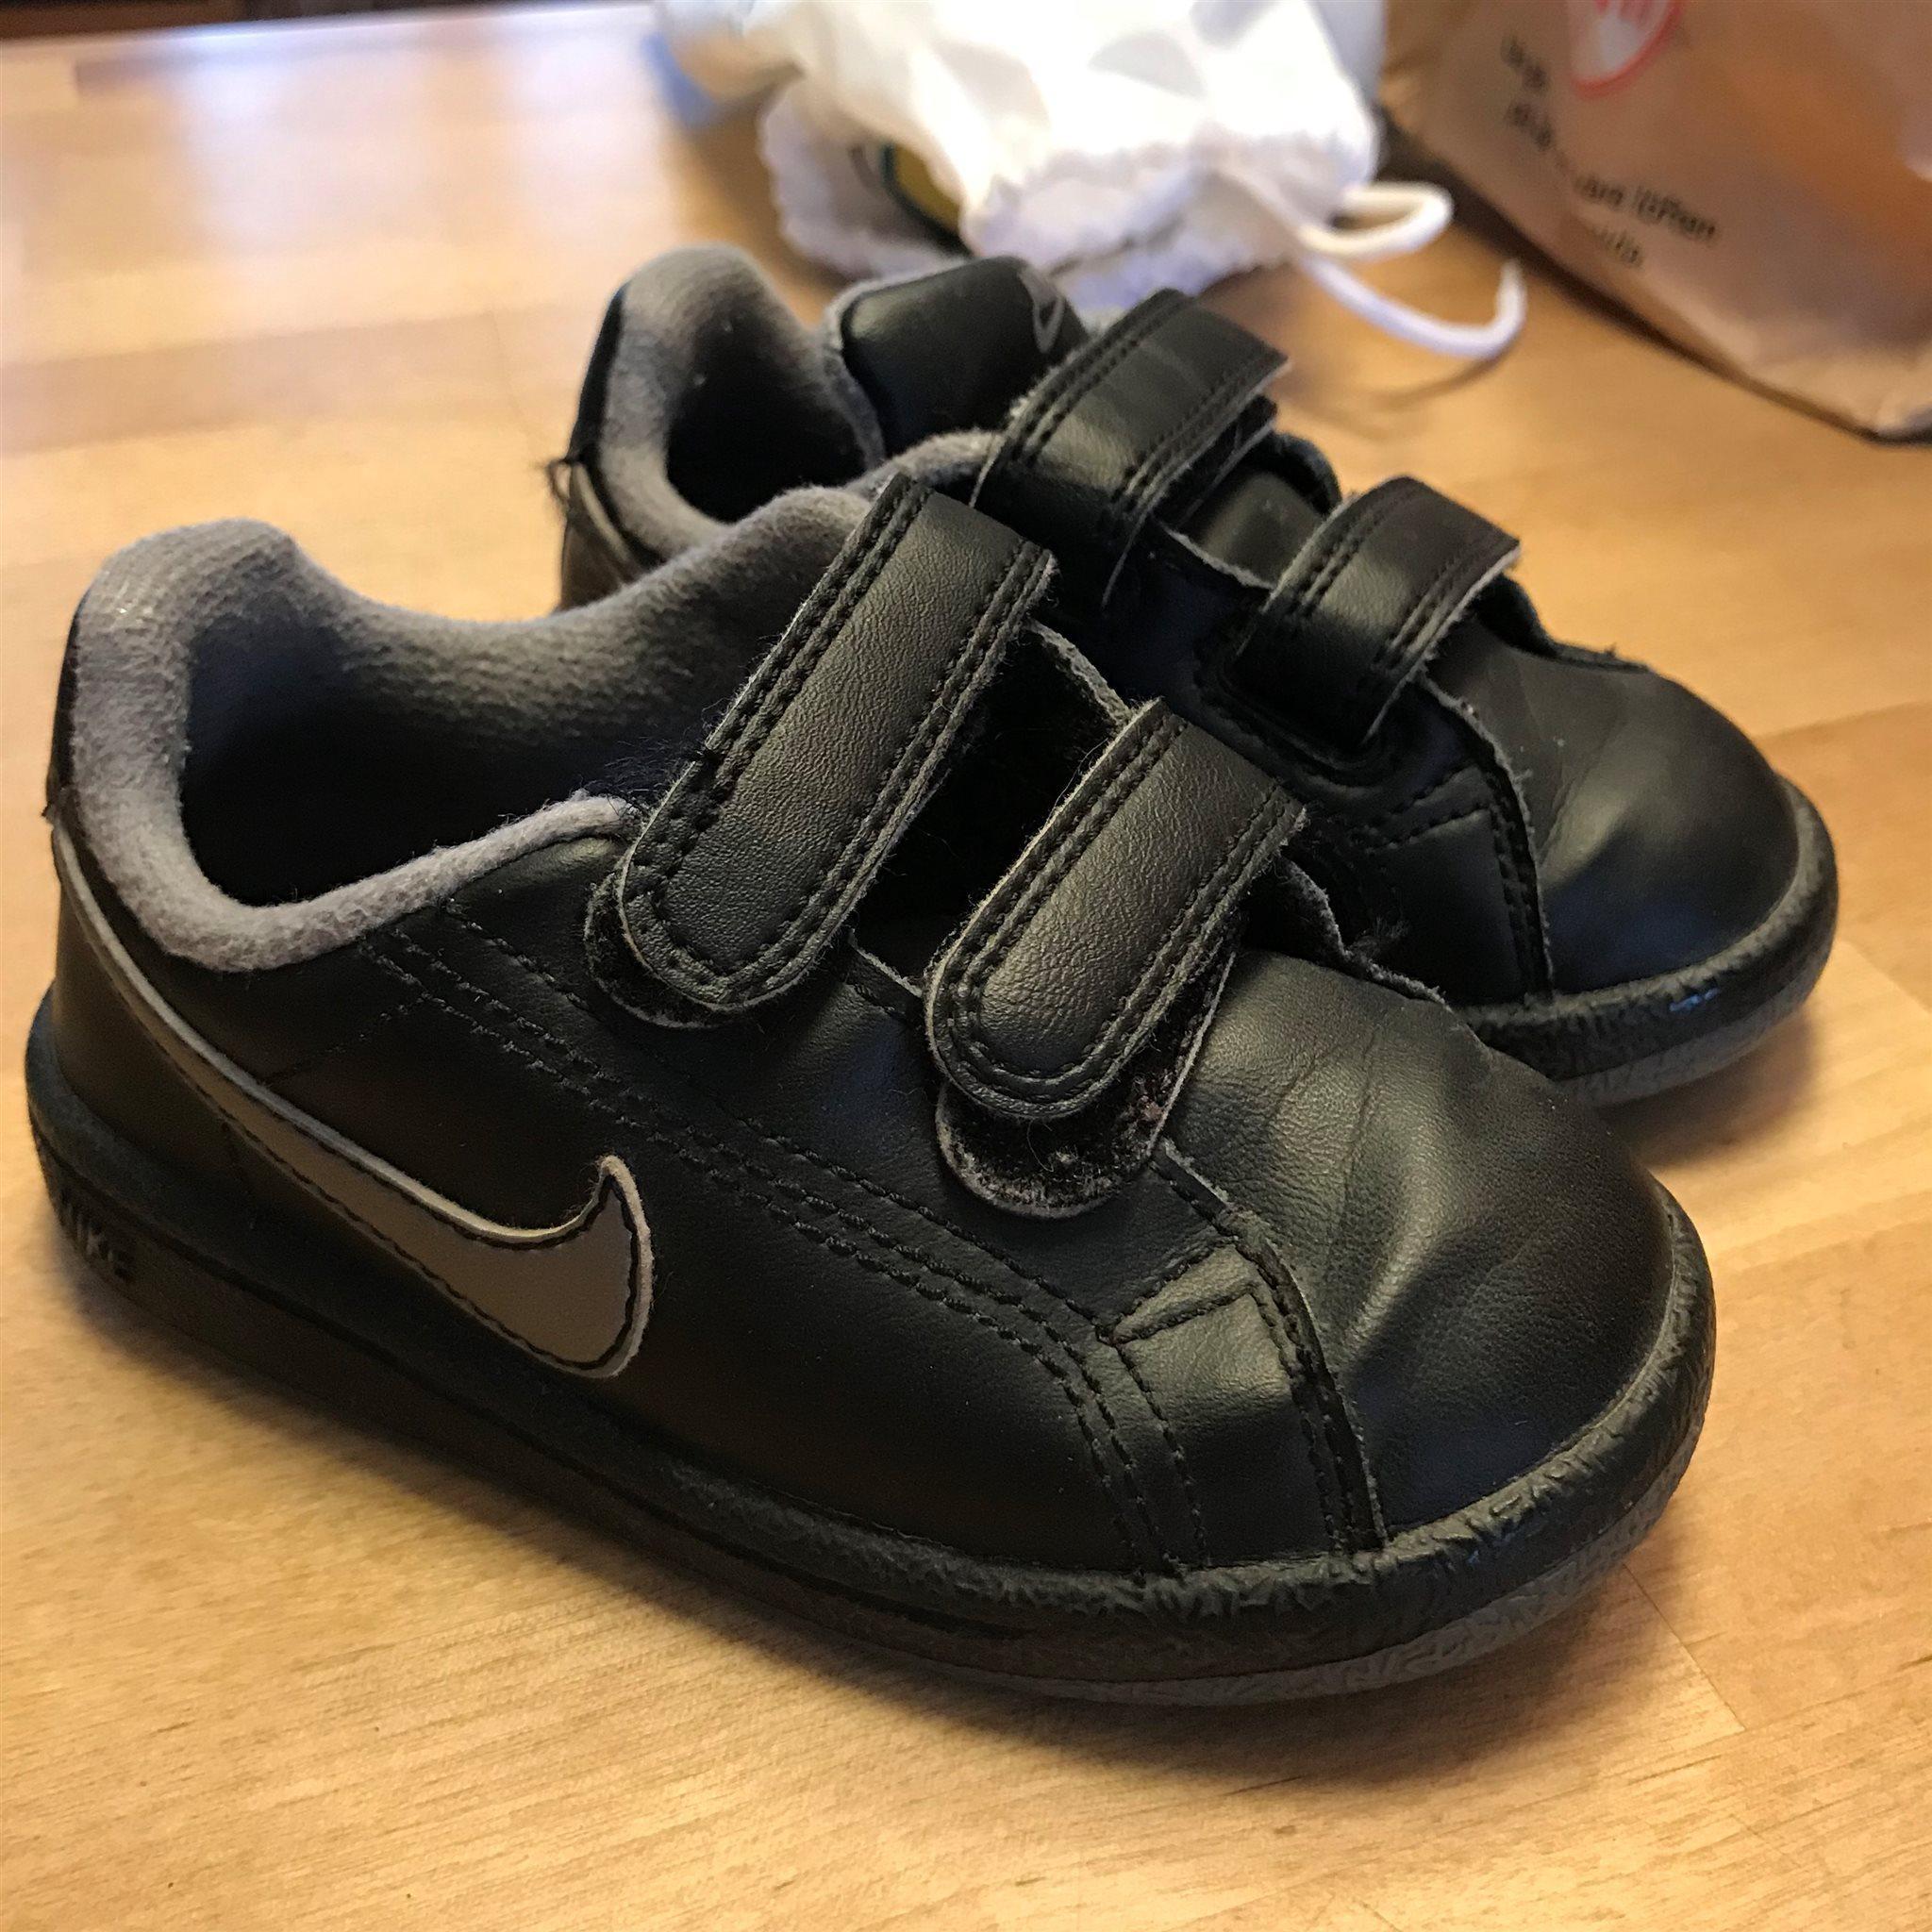 new arrival e8080 4f8ba Nike gymnastiksko skor sneakers, Strl 22